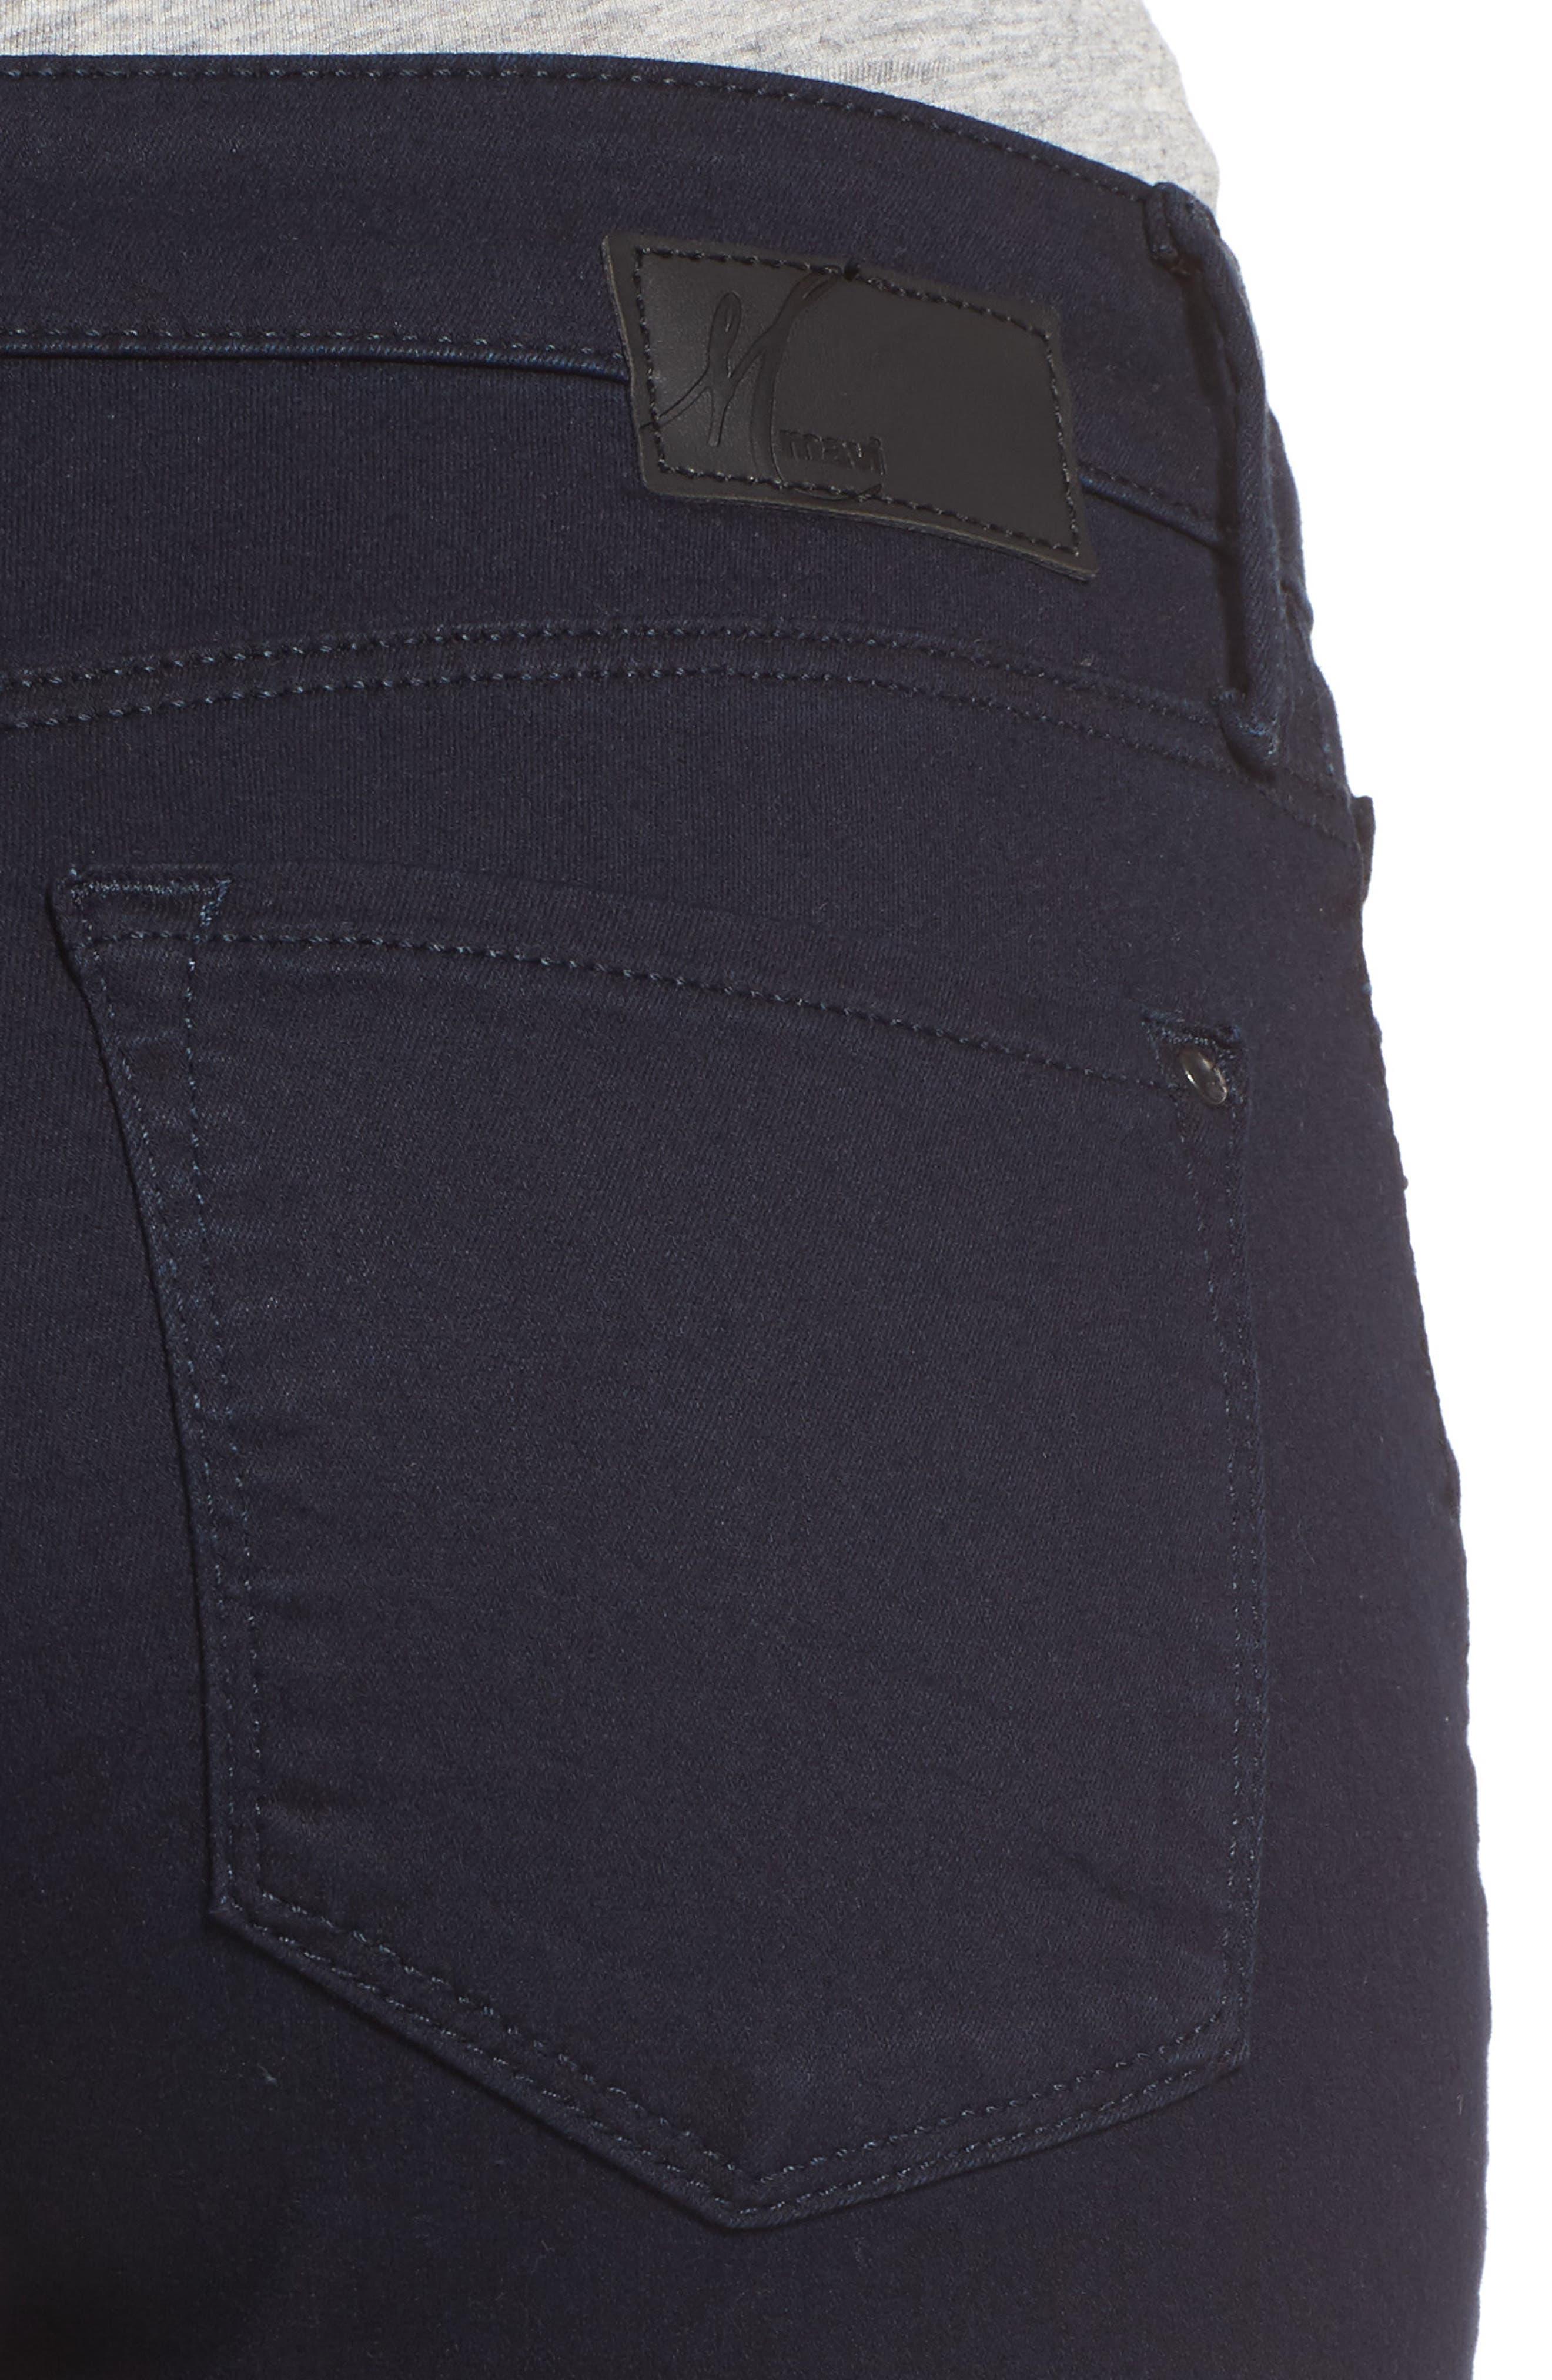 'Alexa' Midrise Skinny Jeans,                             Alternate thumbnail 4, color,                             401